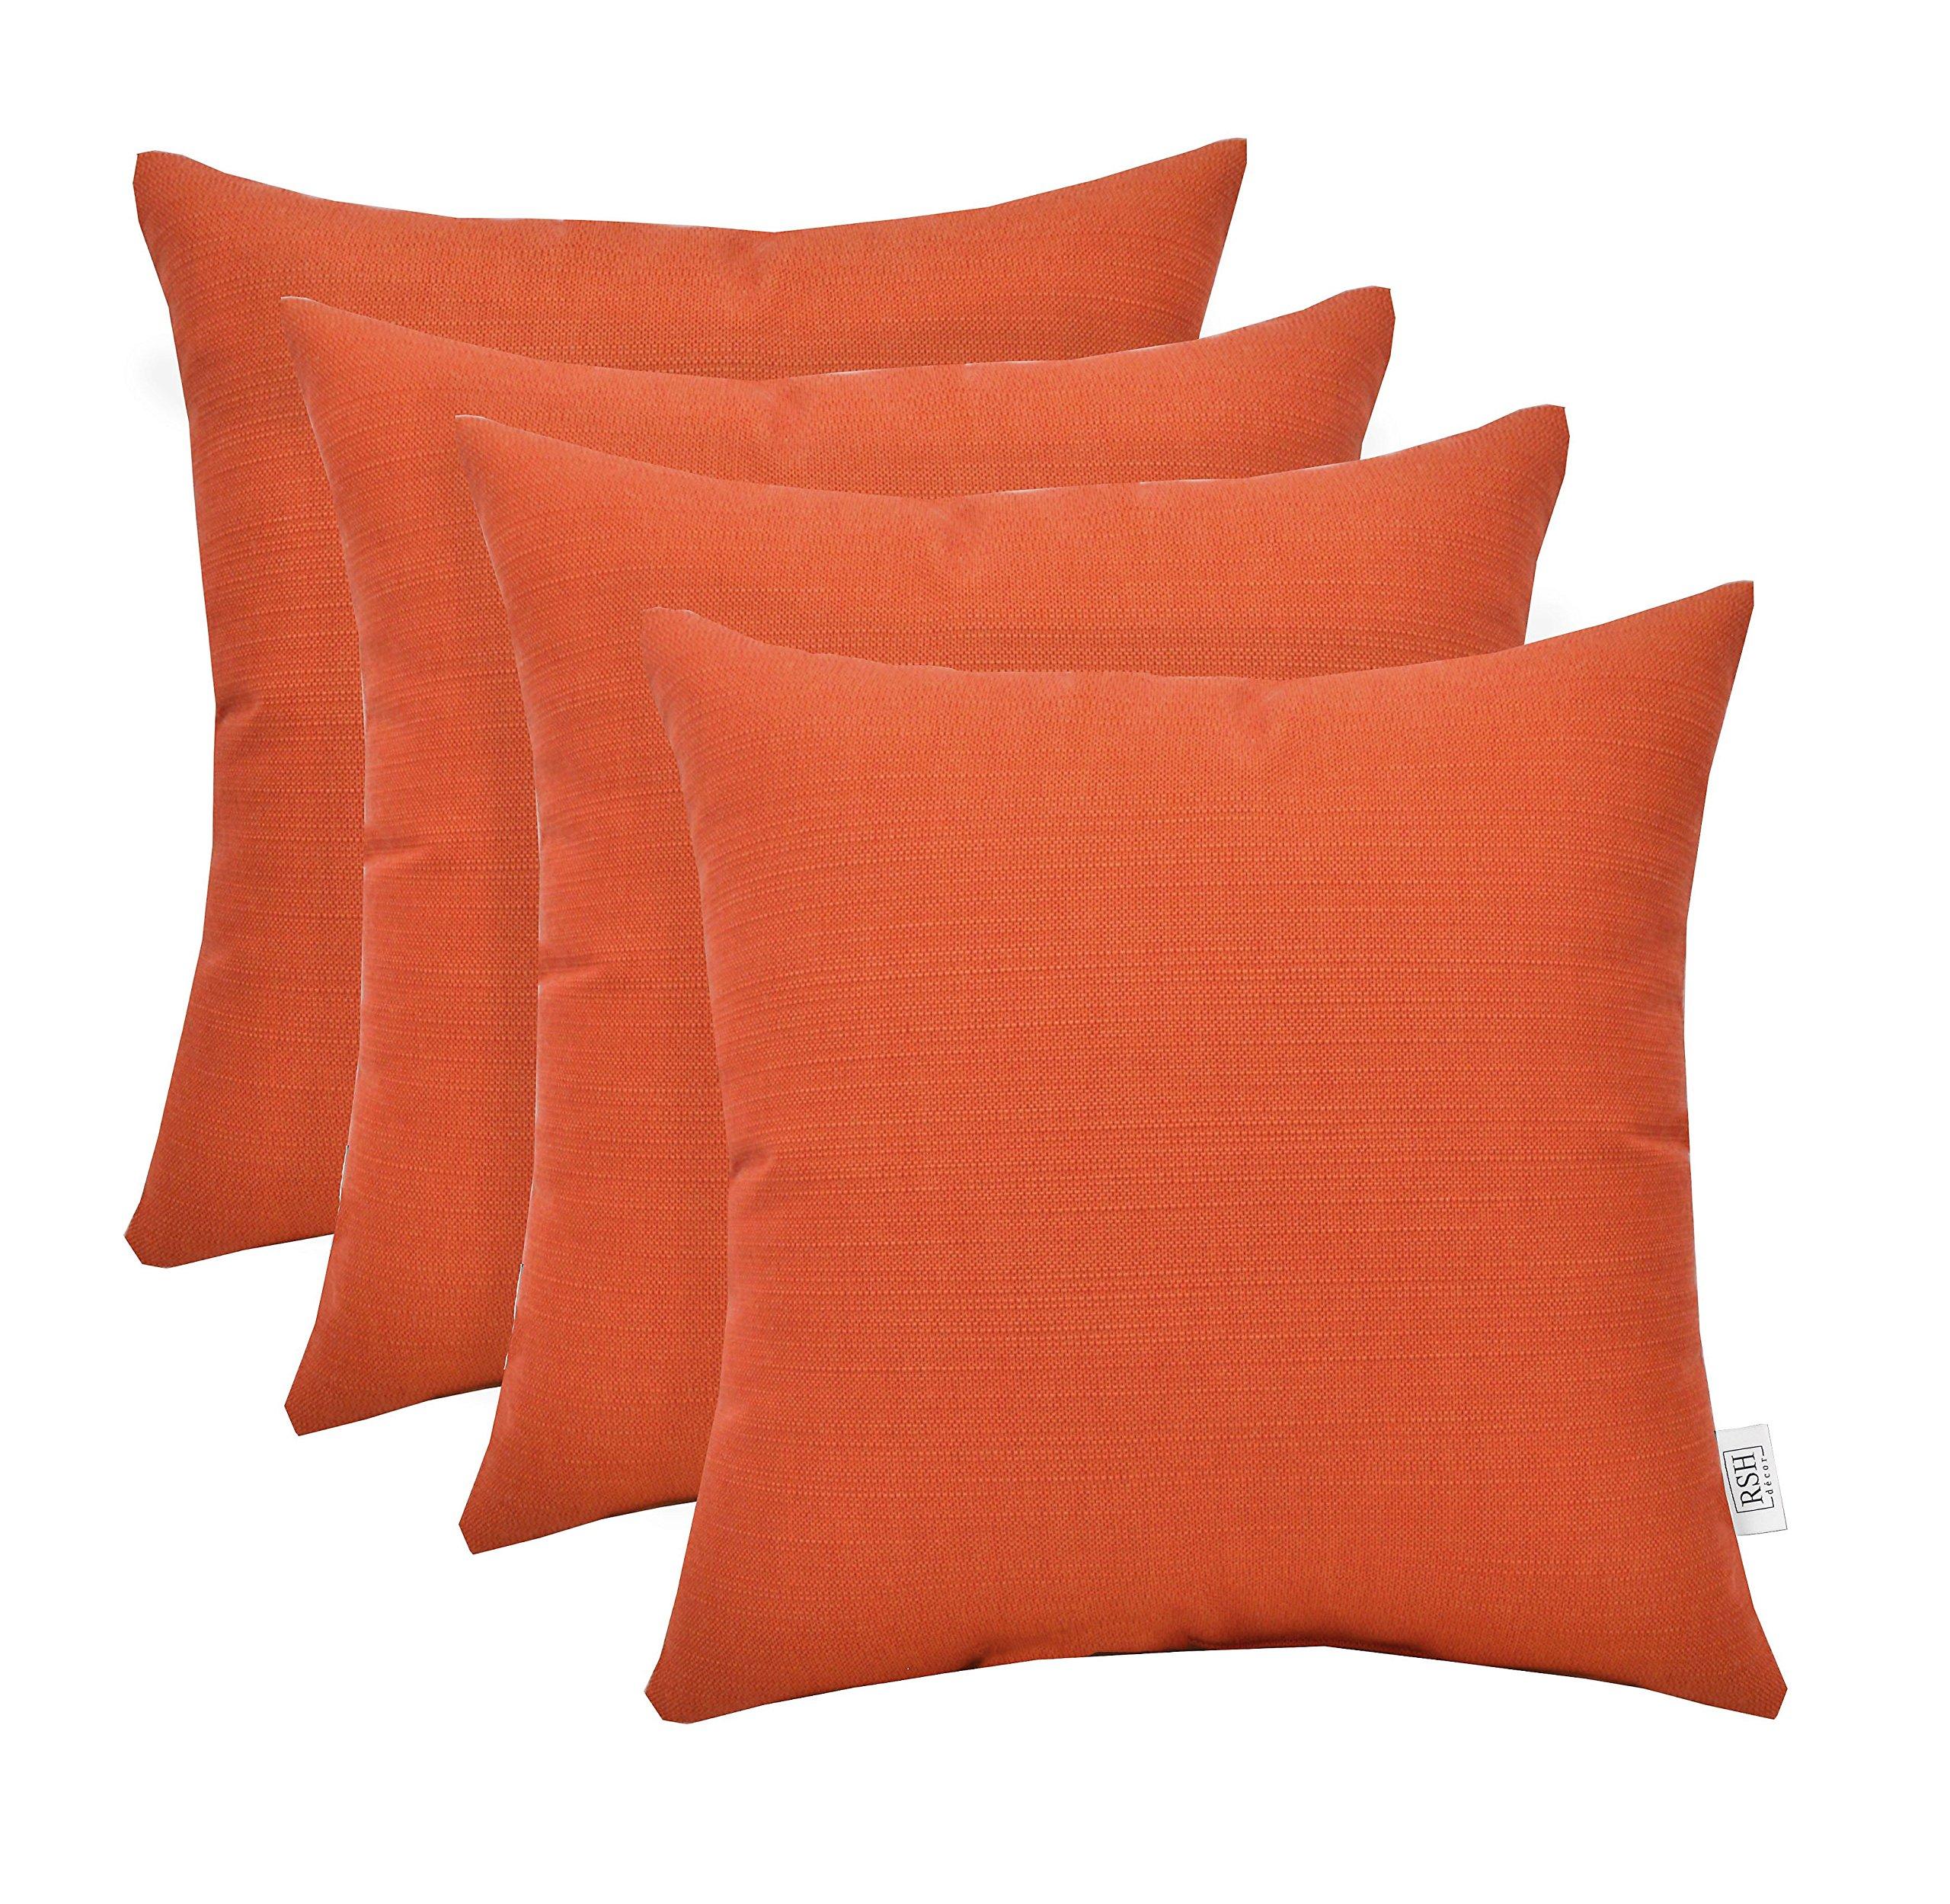 RSH Décor Set of 4 Indoor Outdoor Decorative Throw Pillows Sunbrella Echo Sangria ~ Vibrant Spicy Orange - Choose Size (17'' x 17'')